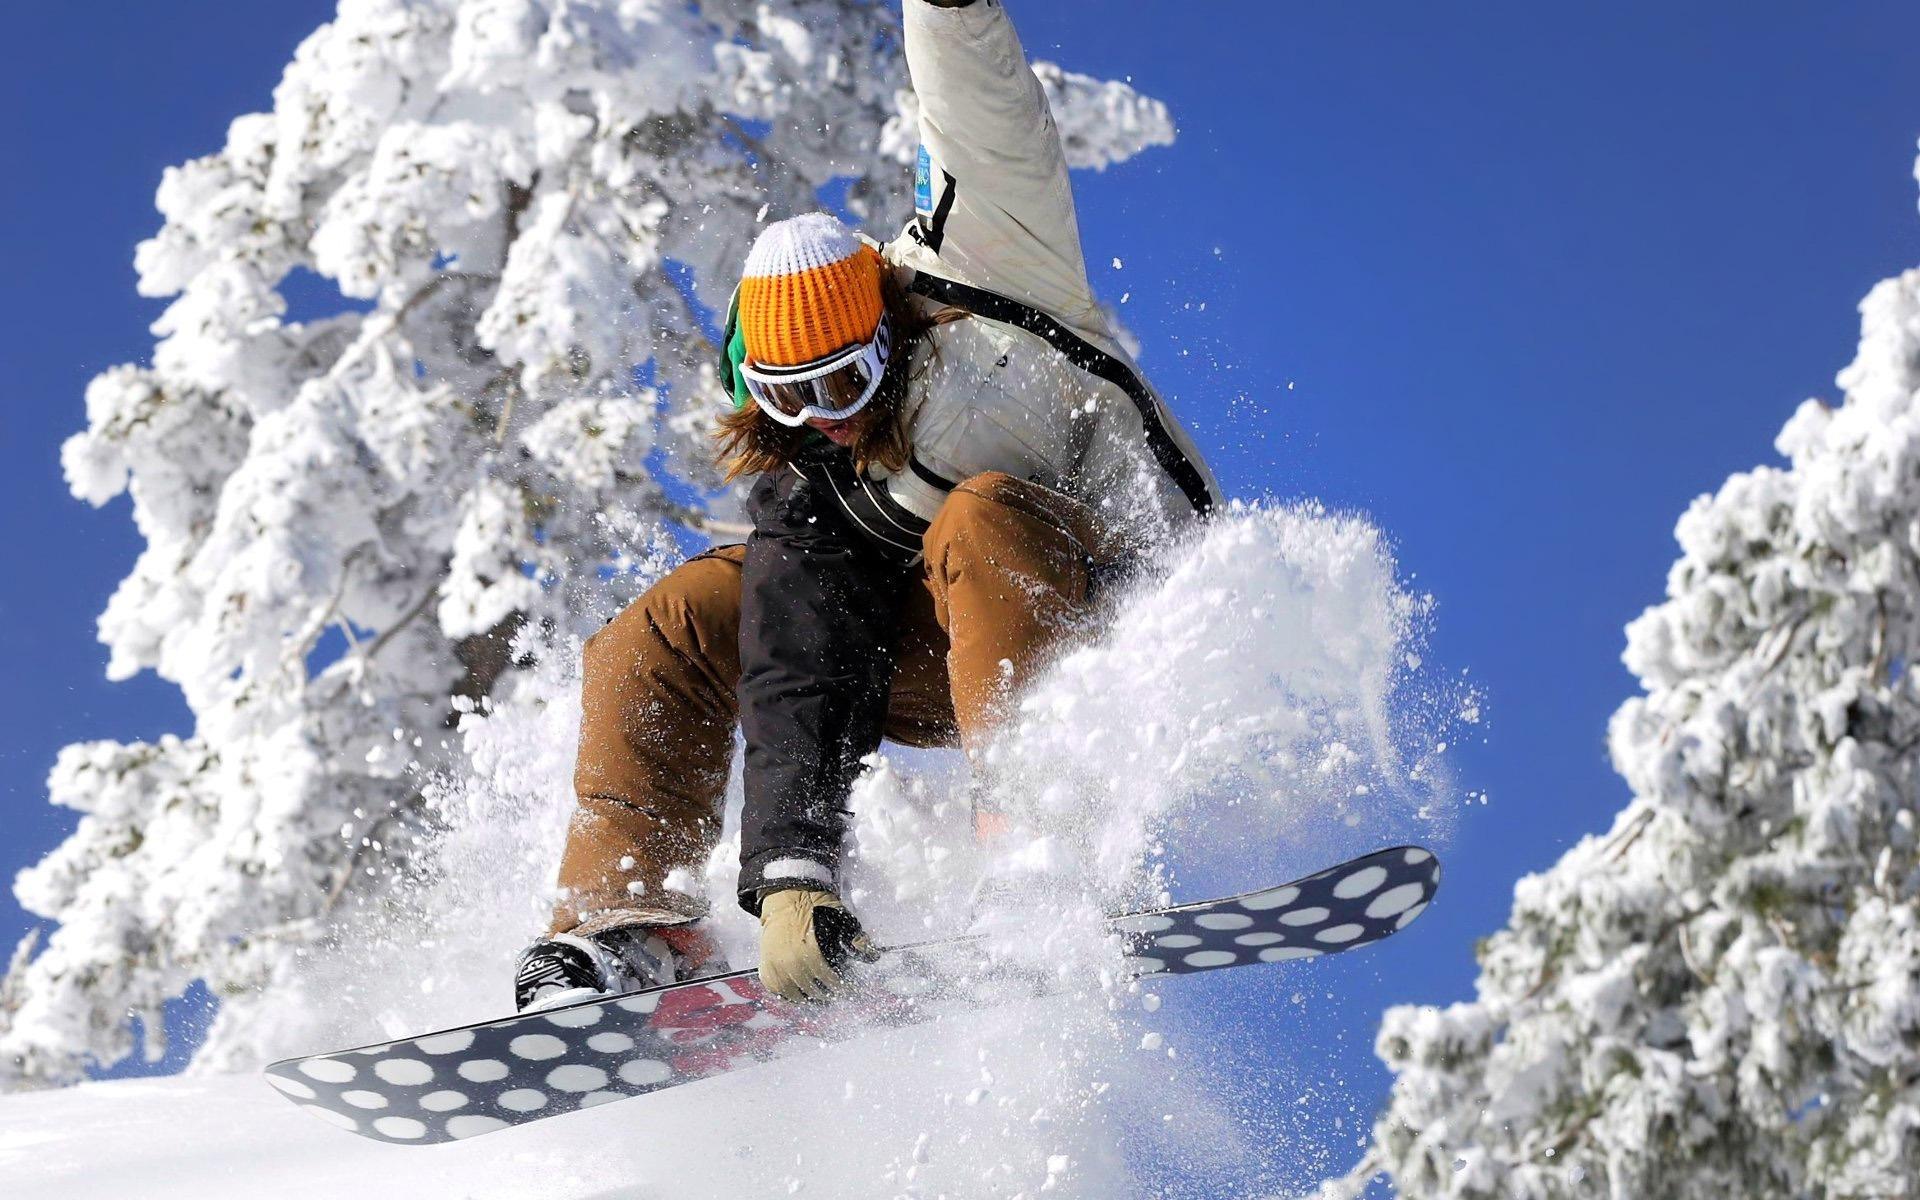 сноубордист вираж снег солнце  № 3559619 бесплатно